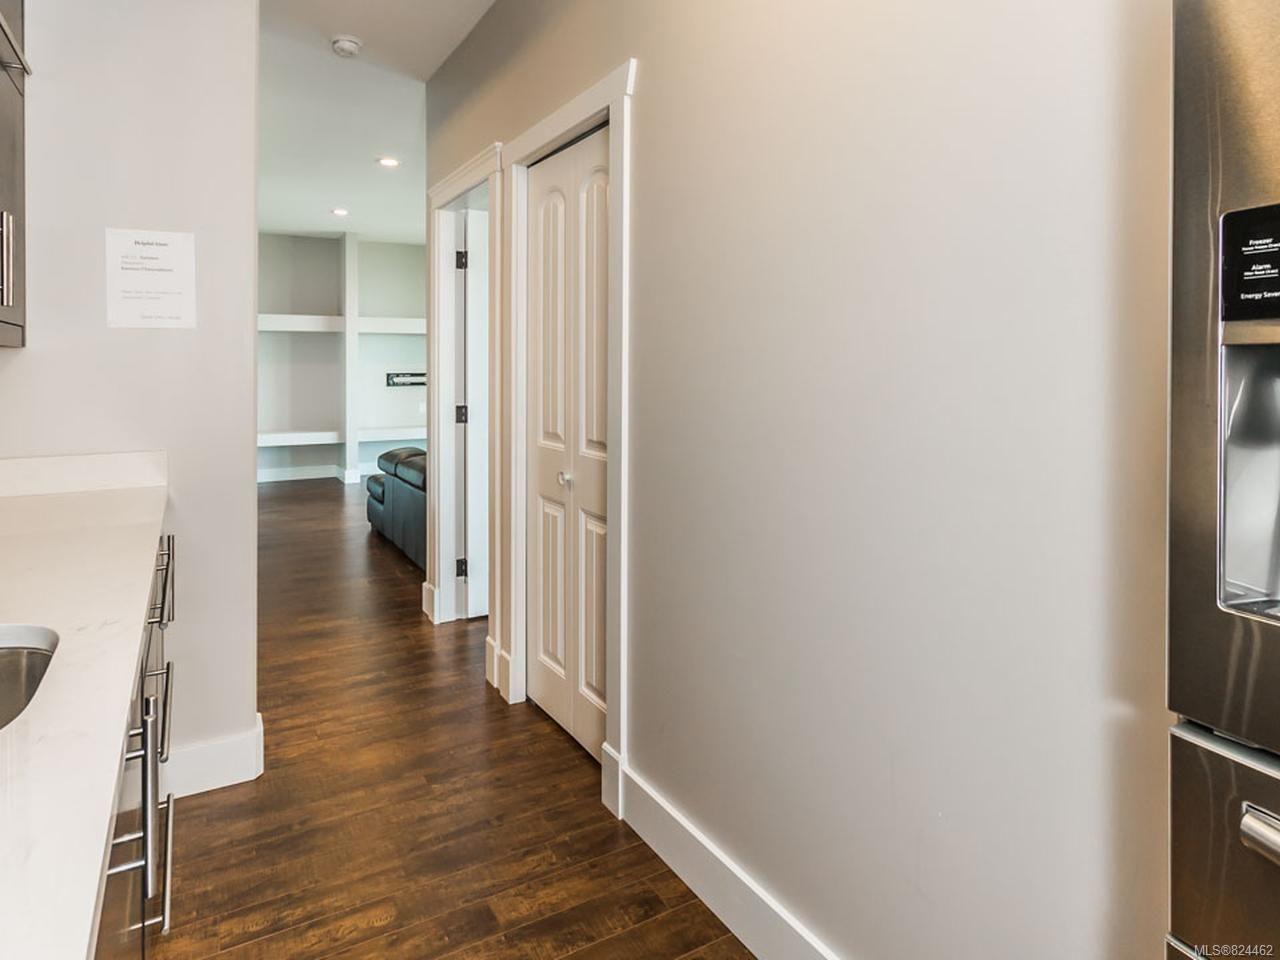 Photo 28: Photos: 3864 Gulfview Dr in NANAIMO: Na North Nanaimo House for sale (Nanaimo)  : MLS®# 824462